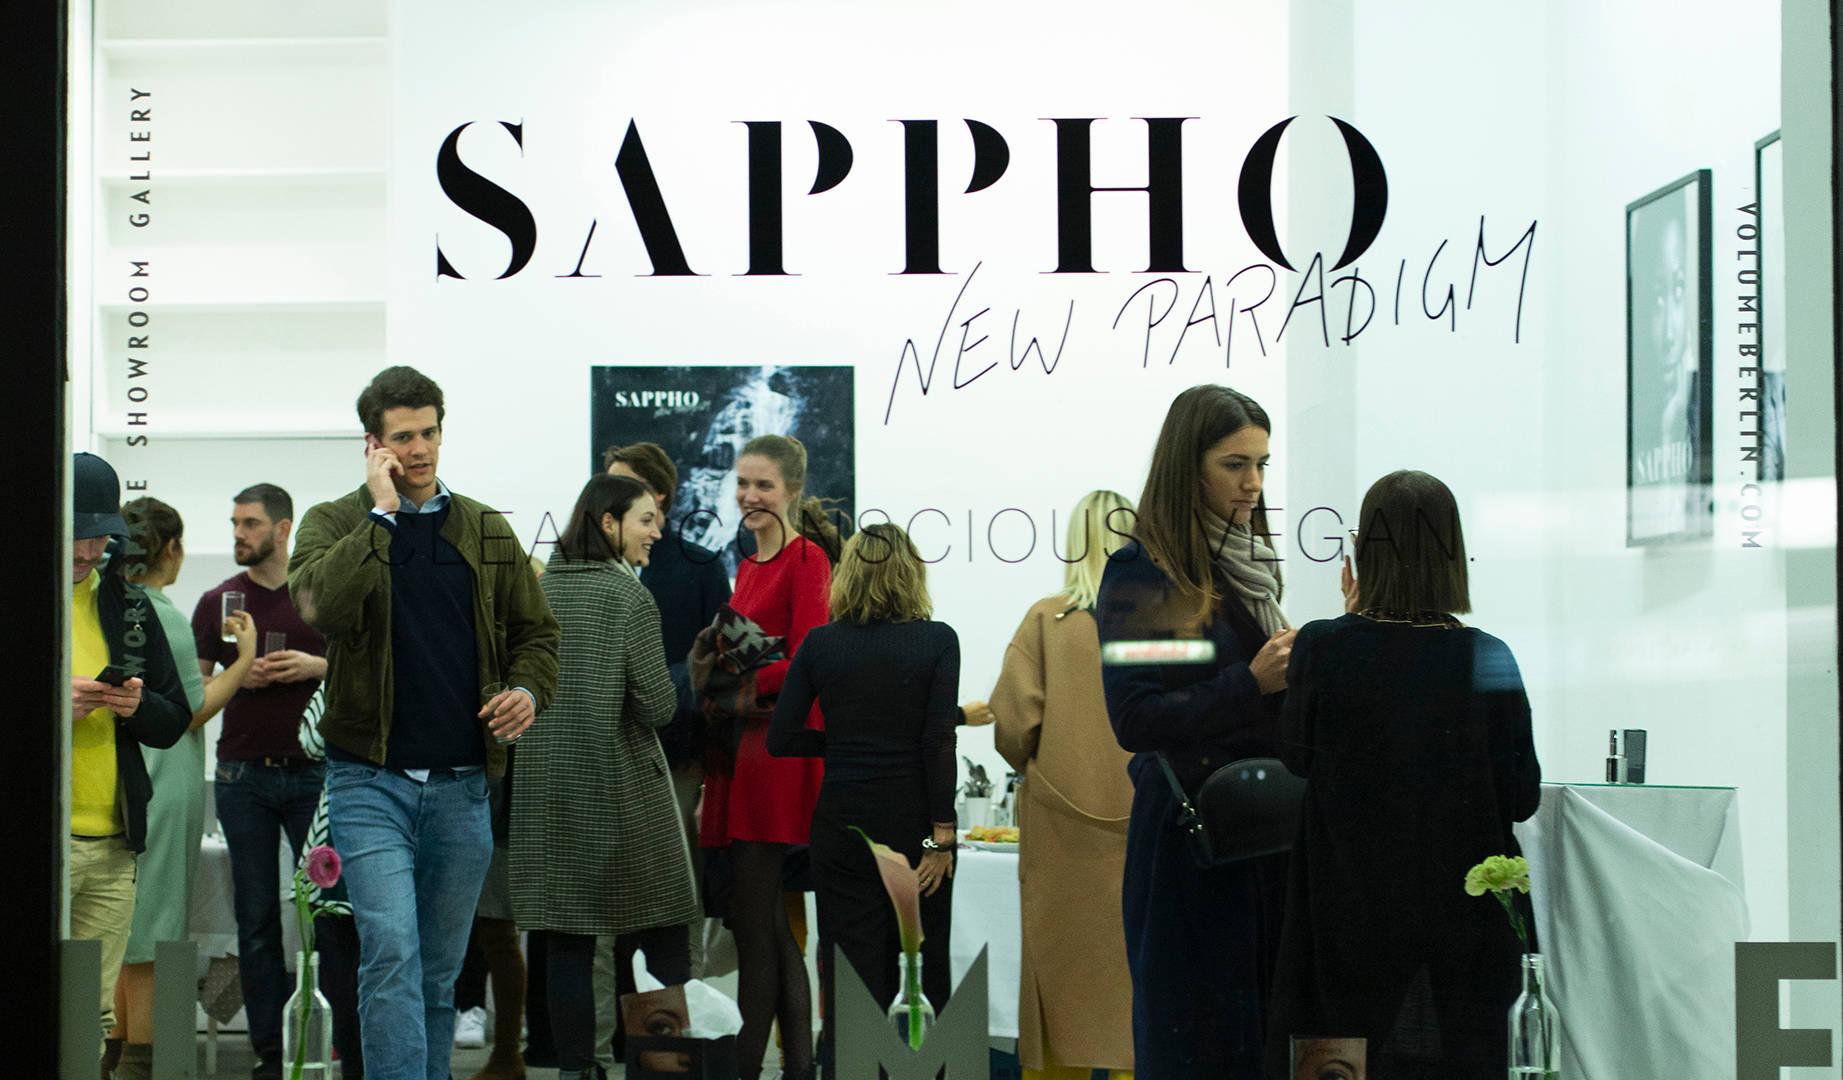 SAPPHO_Lounging_65.jpg